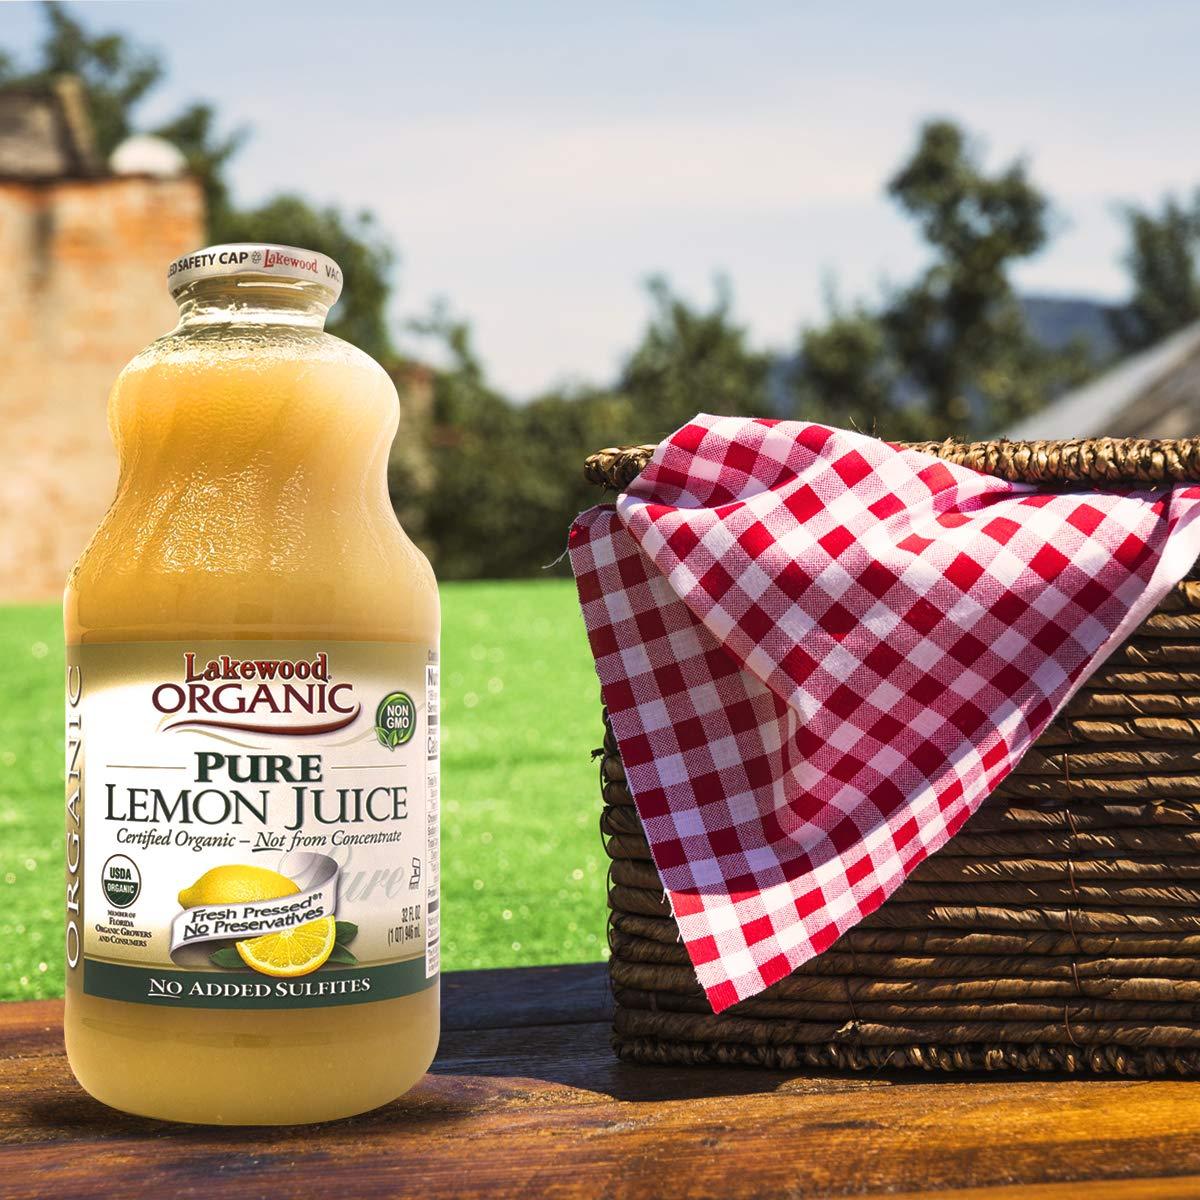 Lakewood Organic Pure Lemon, 32 Ounce (Pack of 6) by Lakewood (Image #5)